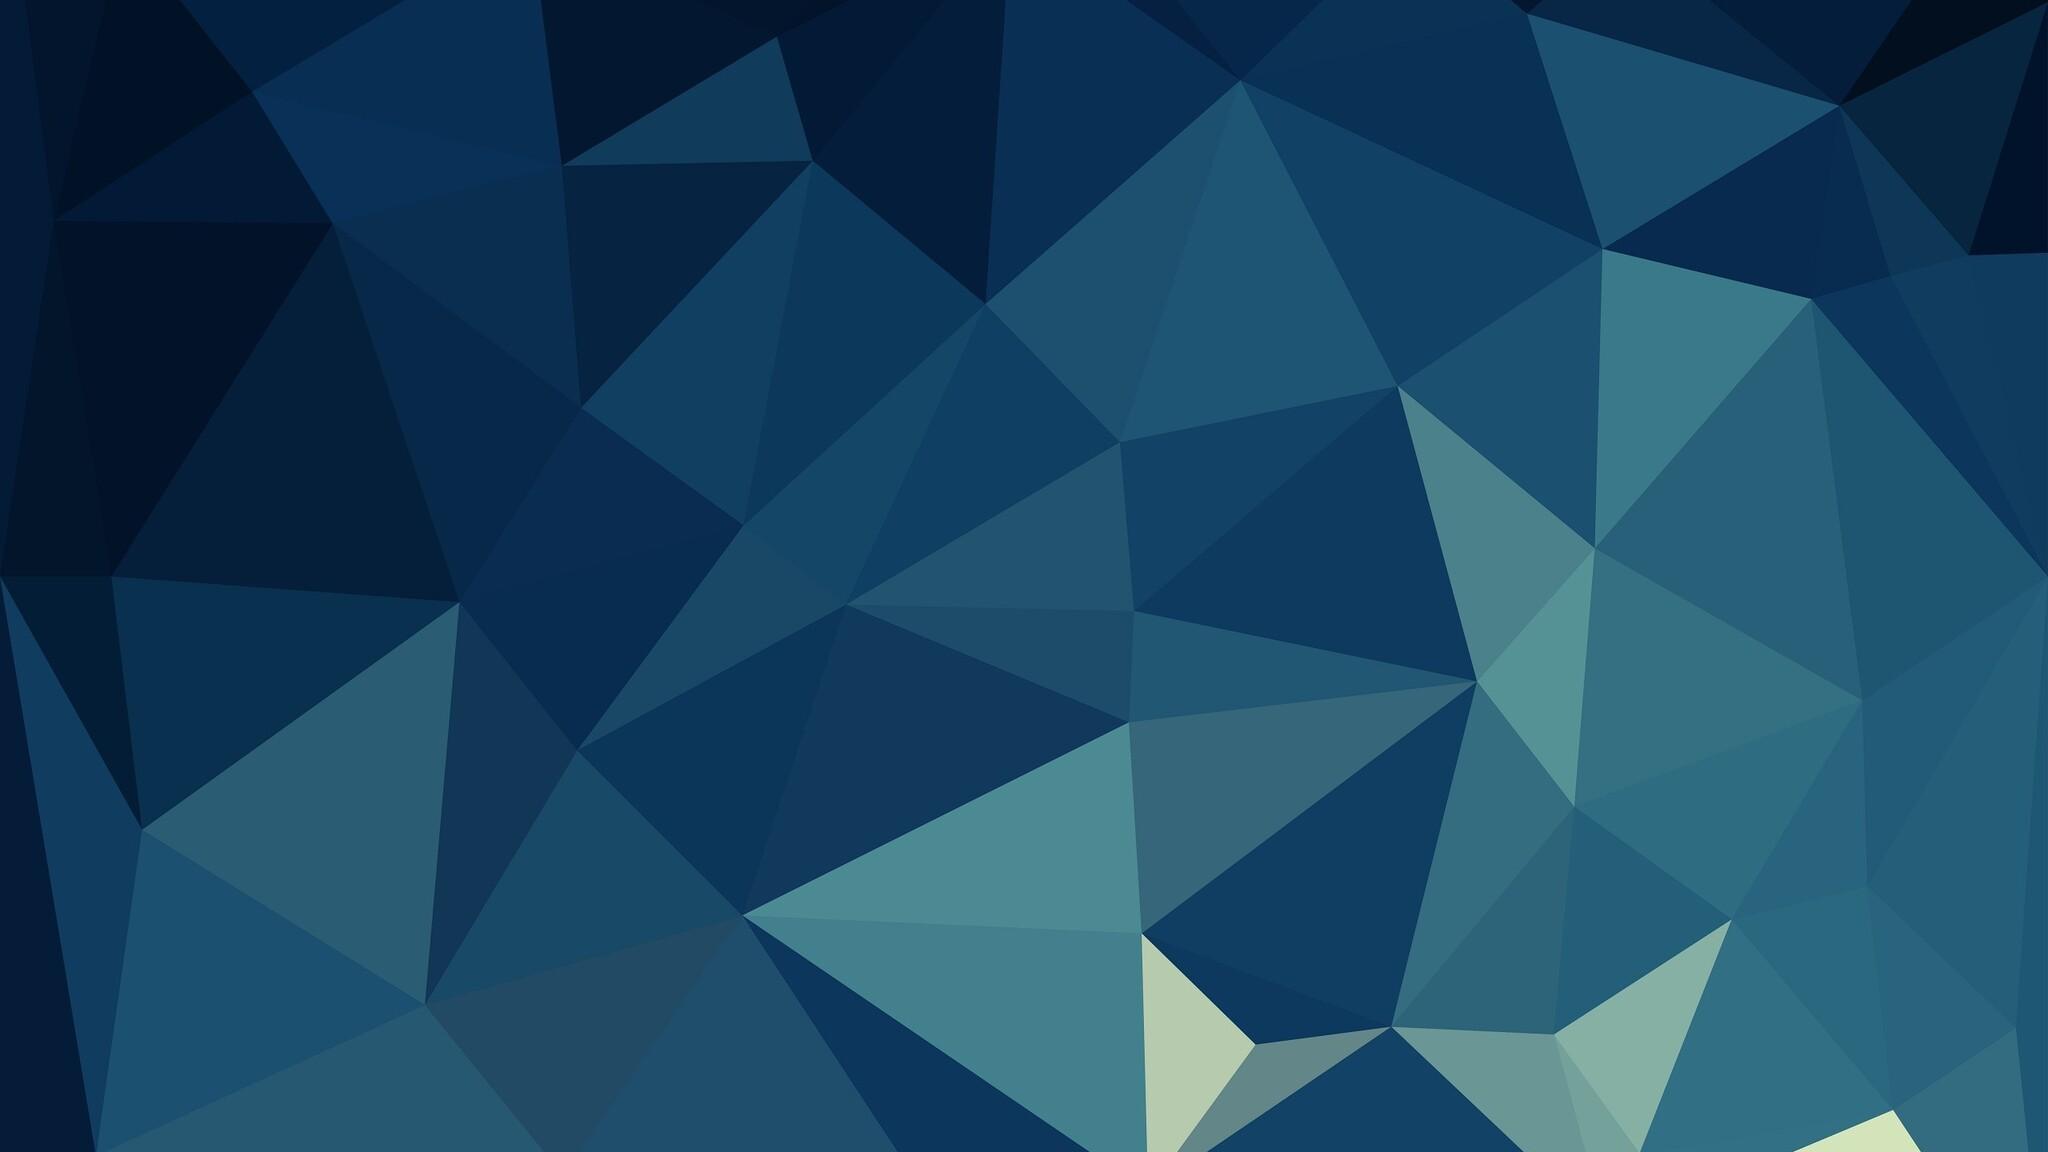 2048x1152 minimalism triangle art 2048x1152 resolution hd for Minimal art youtube